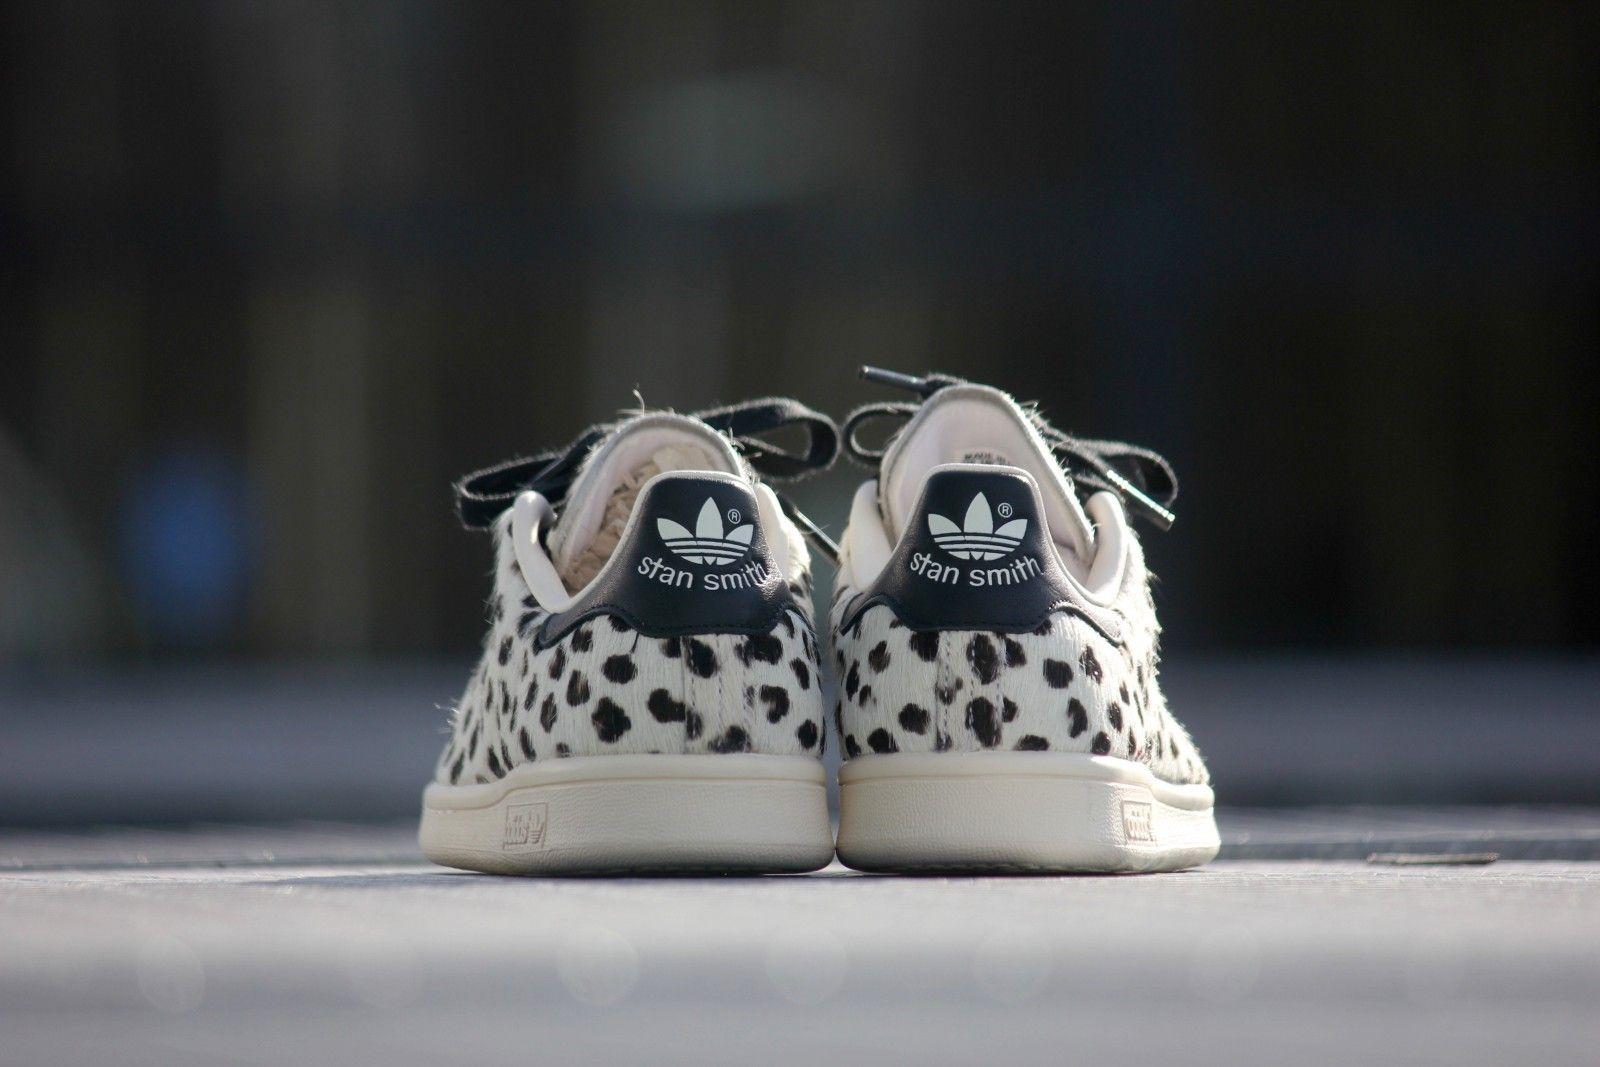 Adidas Stan Smith White Leopard Print - S75117 | Schoenen ...